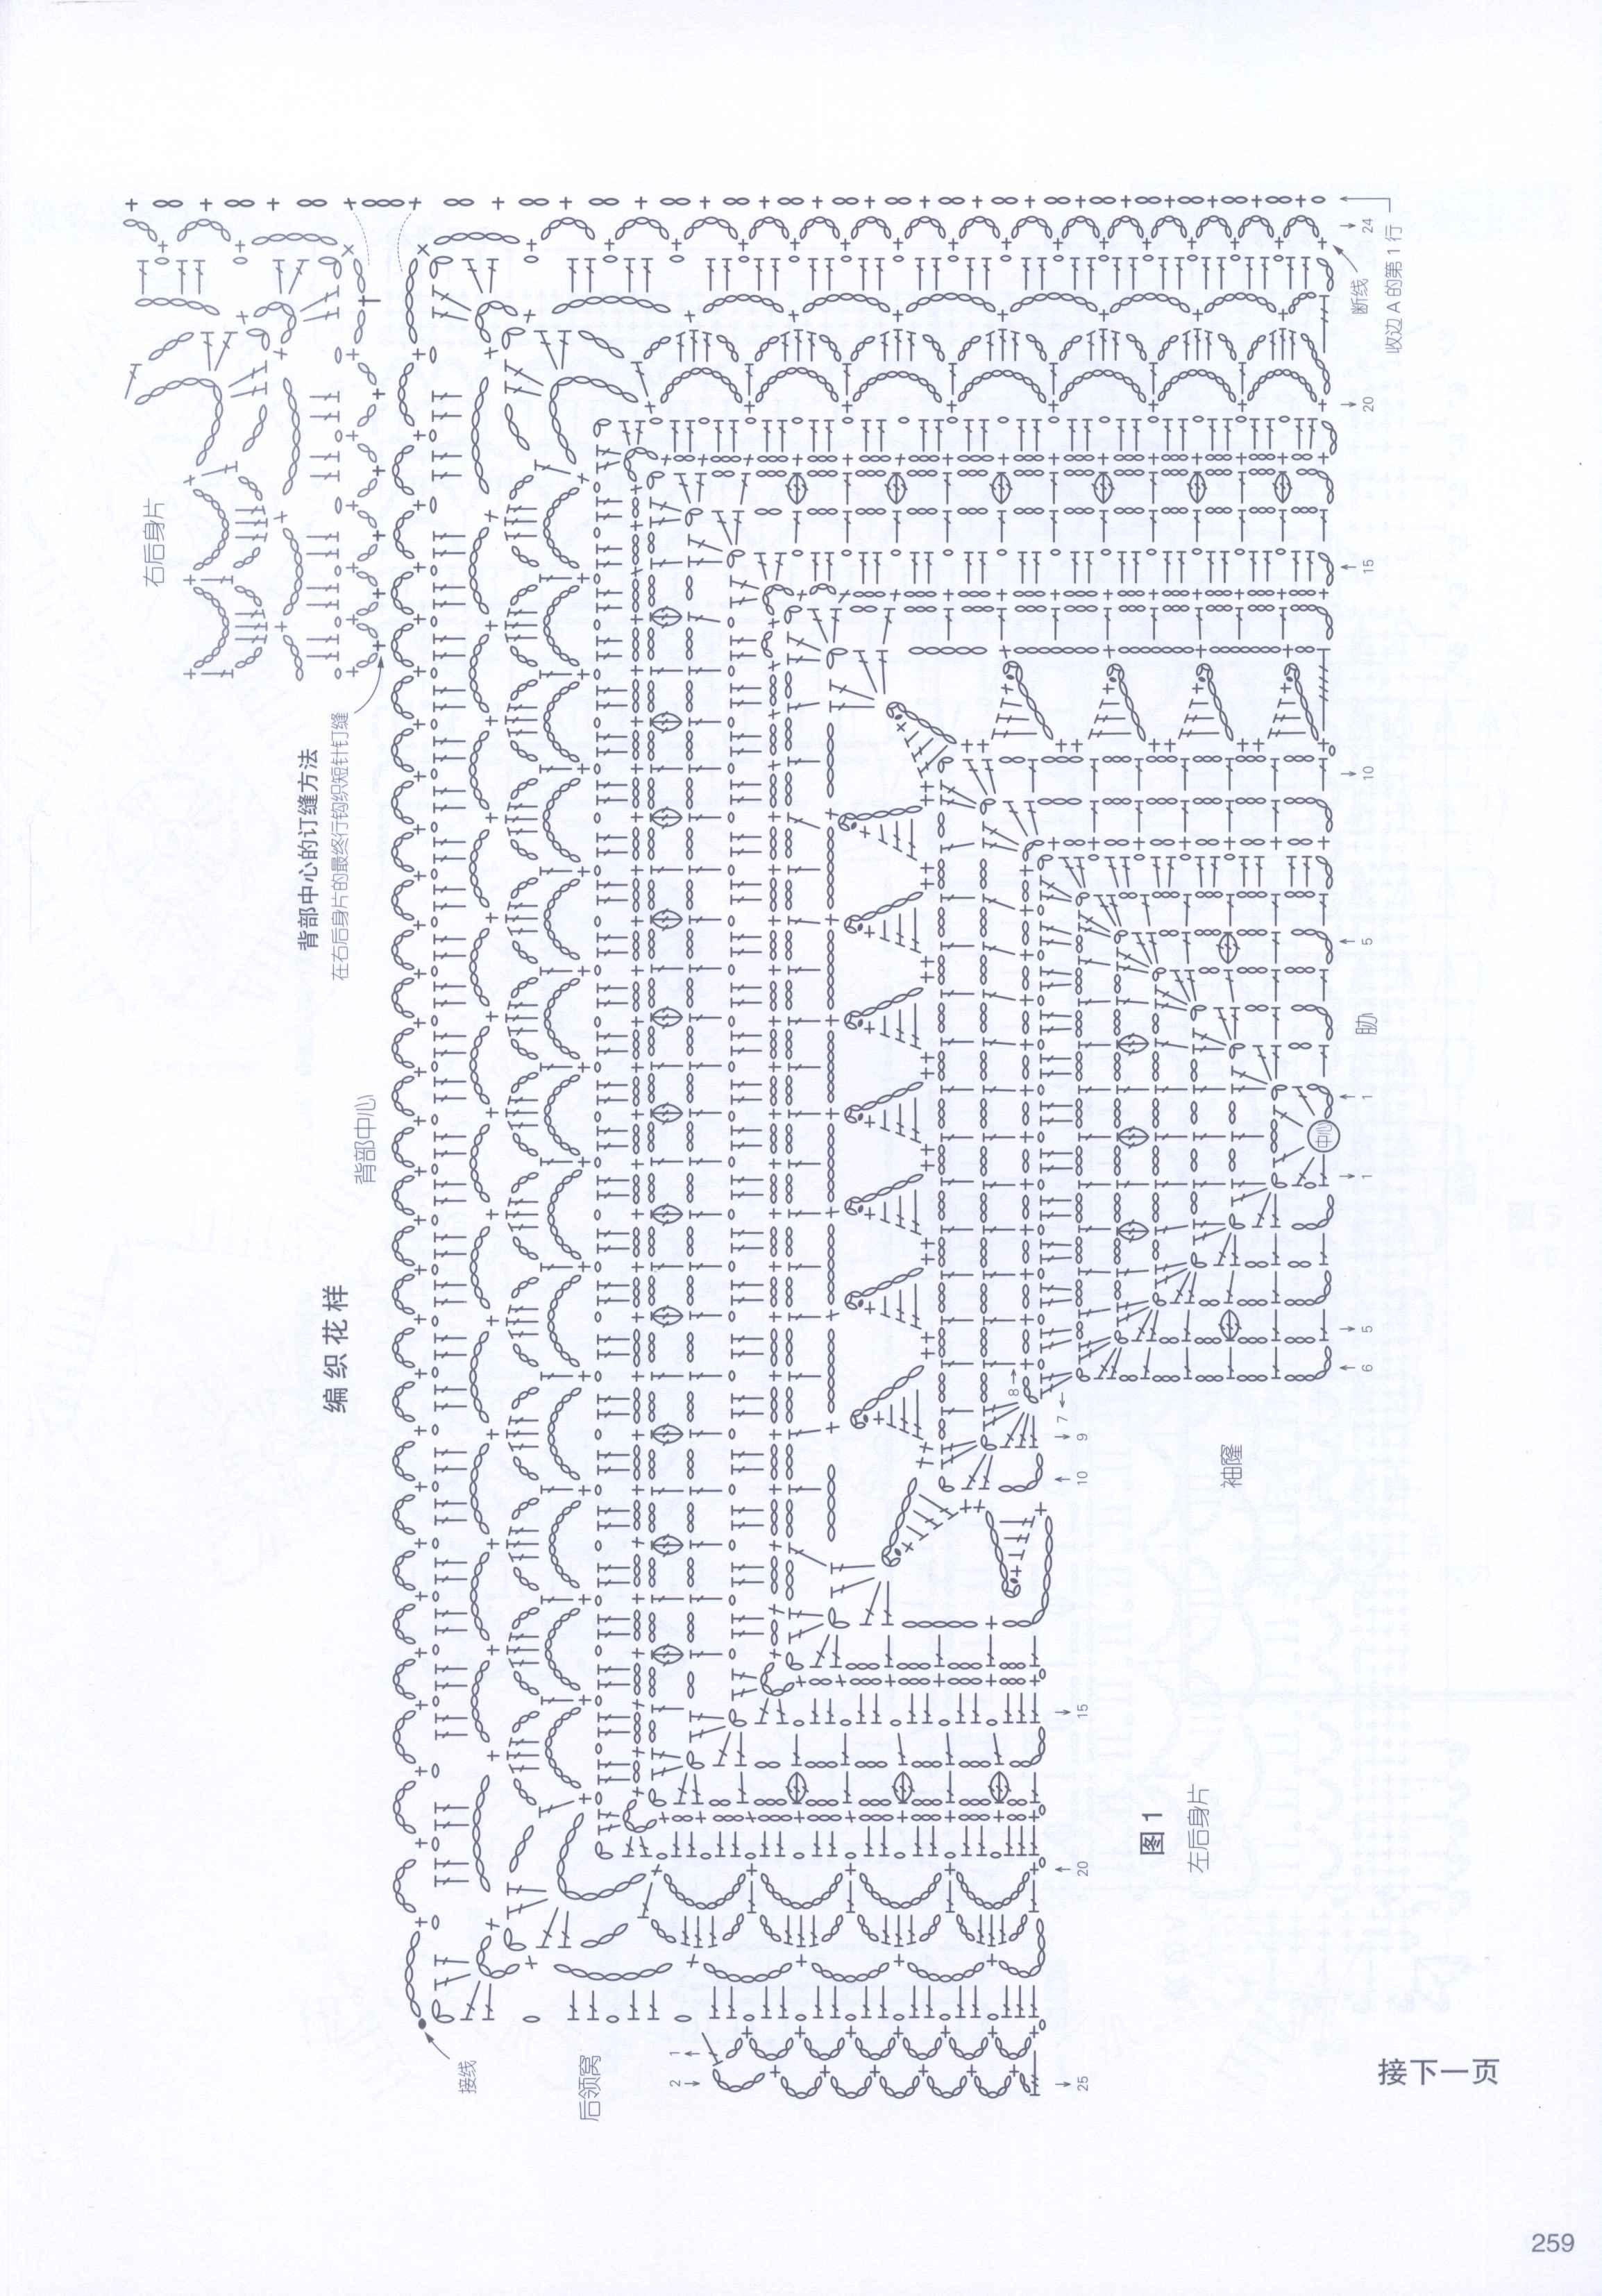 Ggz7qxx8